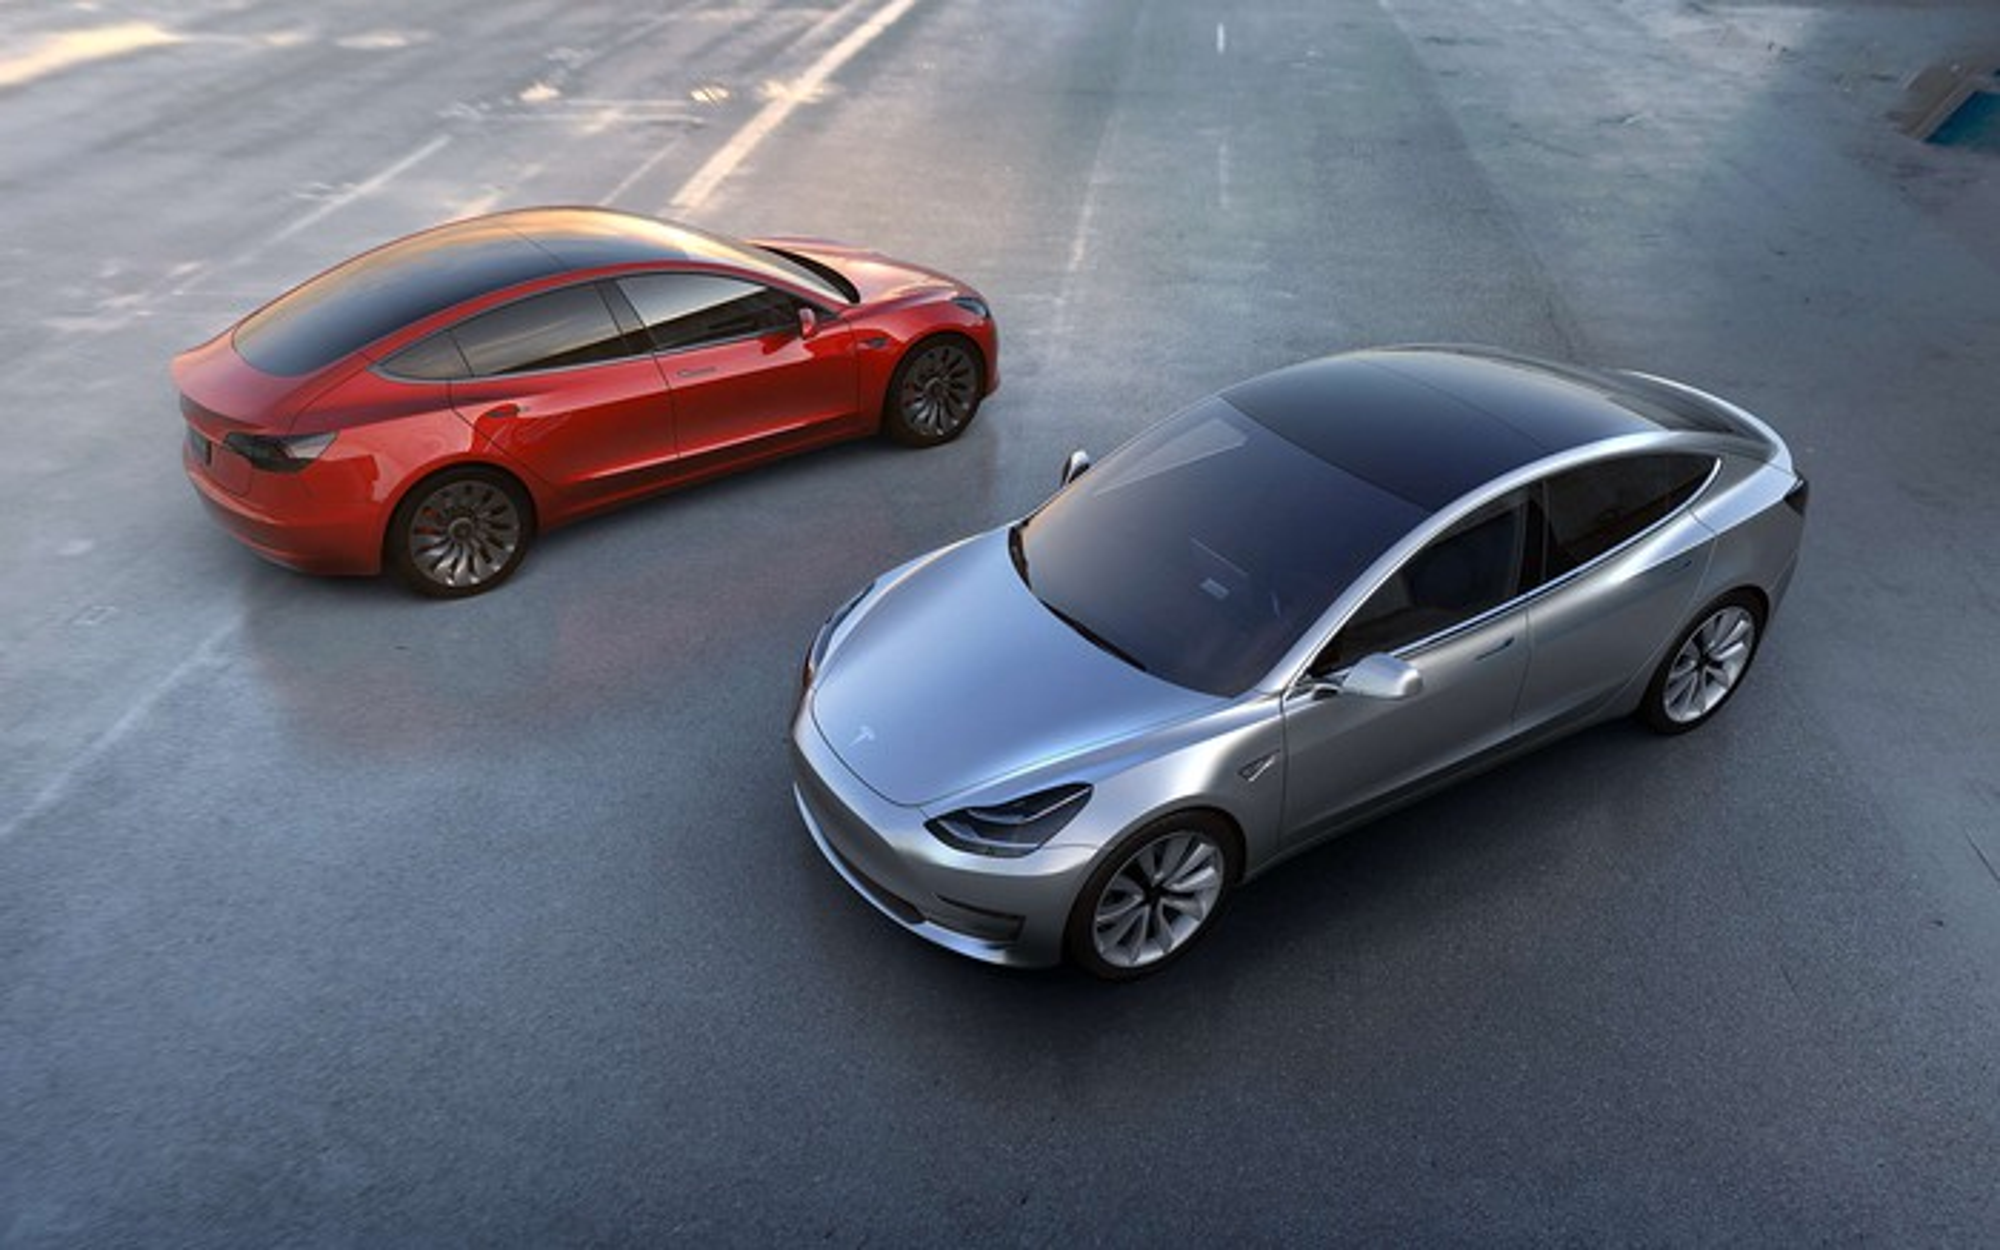 Two Tesla Model 3 cars